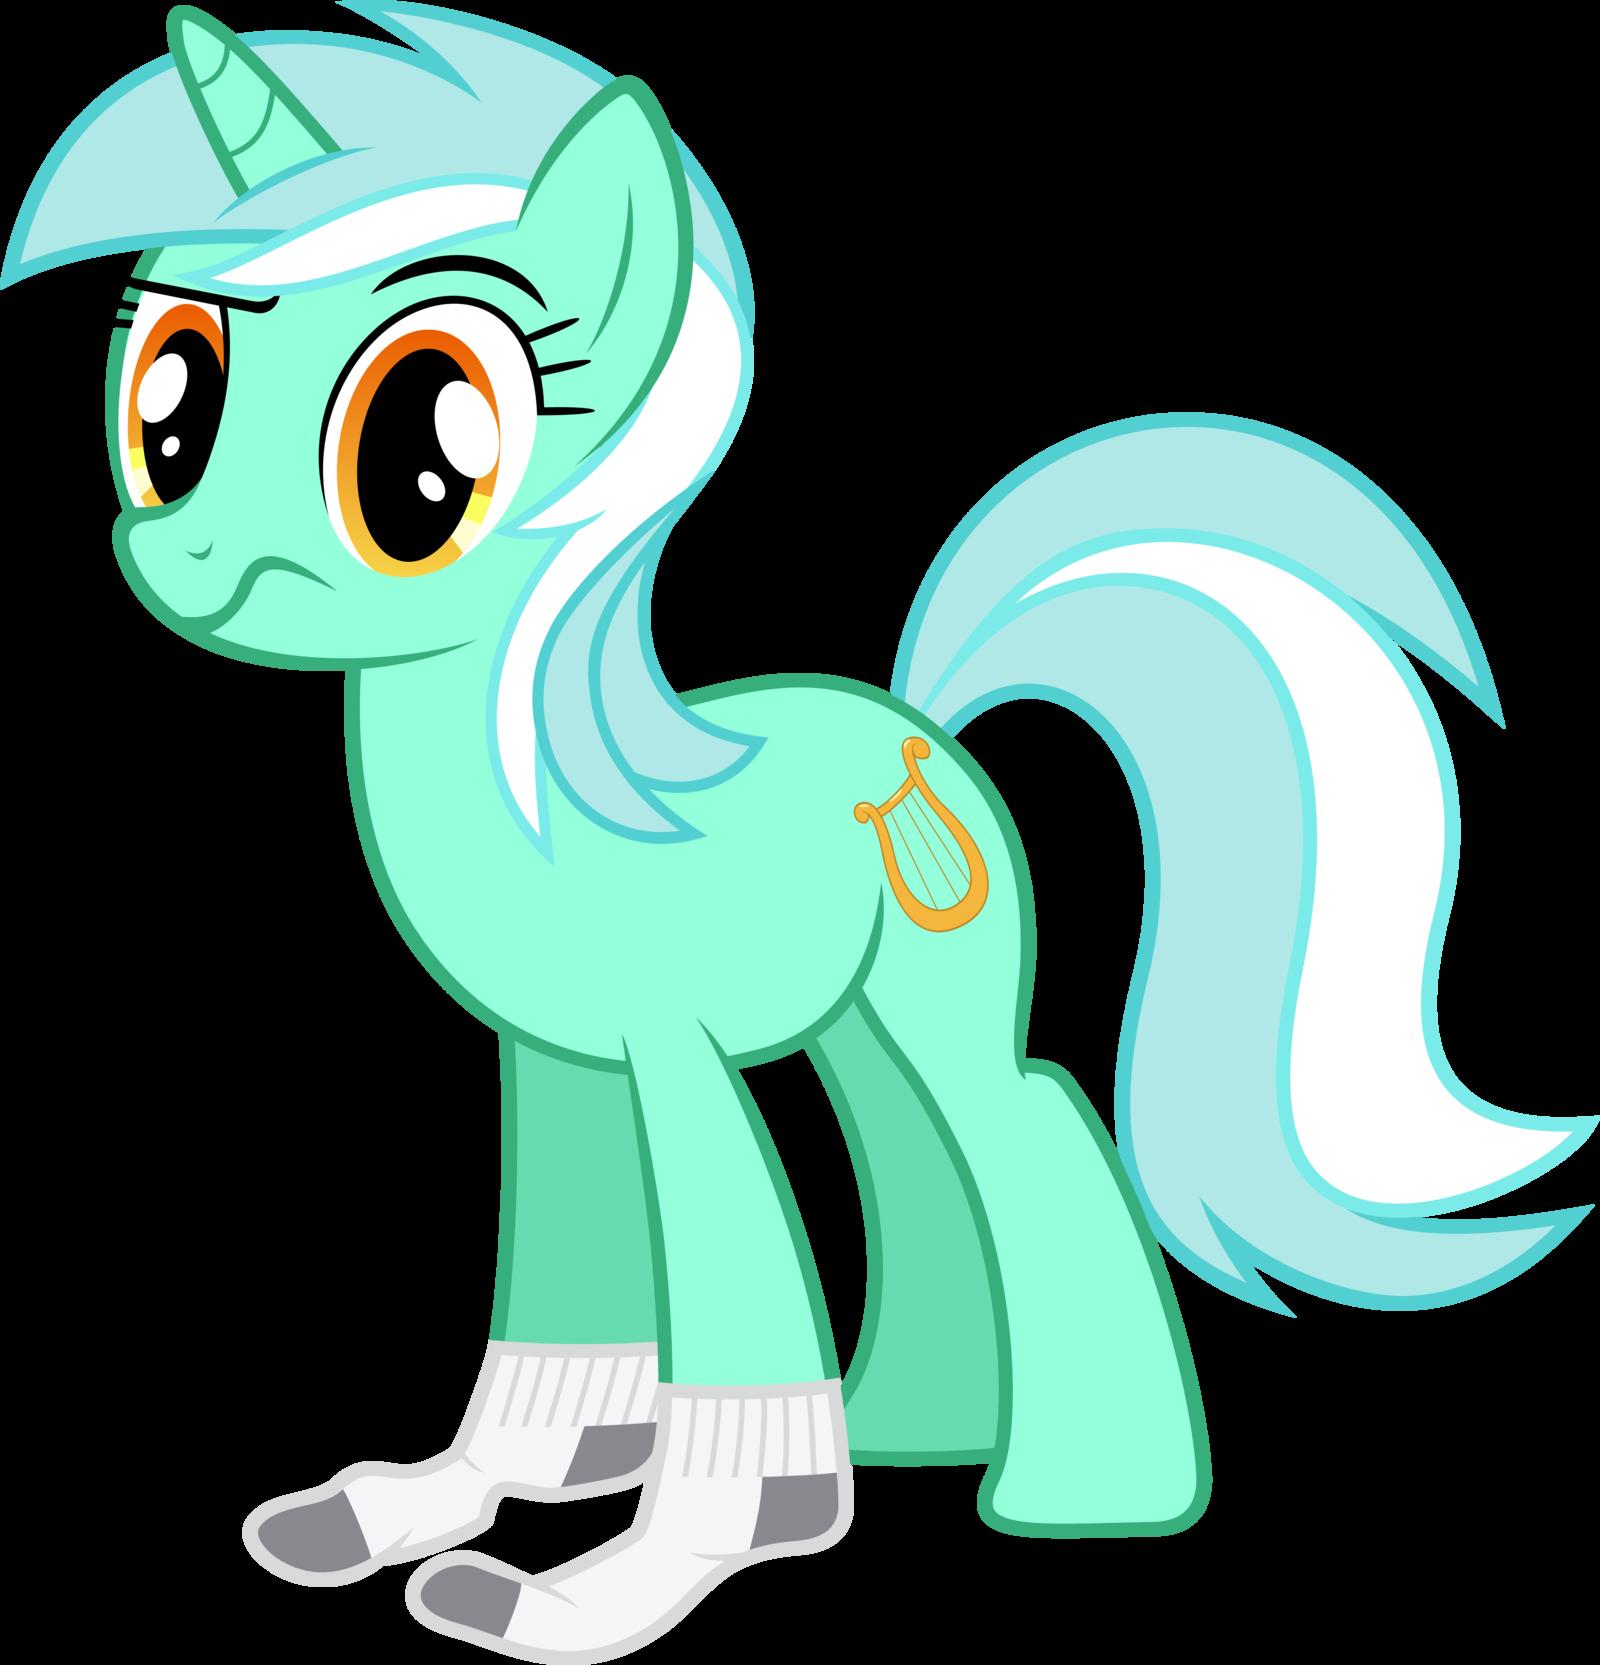 Pone with socks re sexy (͡° ͜ʖ ͡°). http://vladimirmacholzraum.deviantarm.. Oh hot she's got socks on MLP Lyra